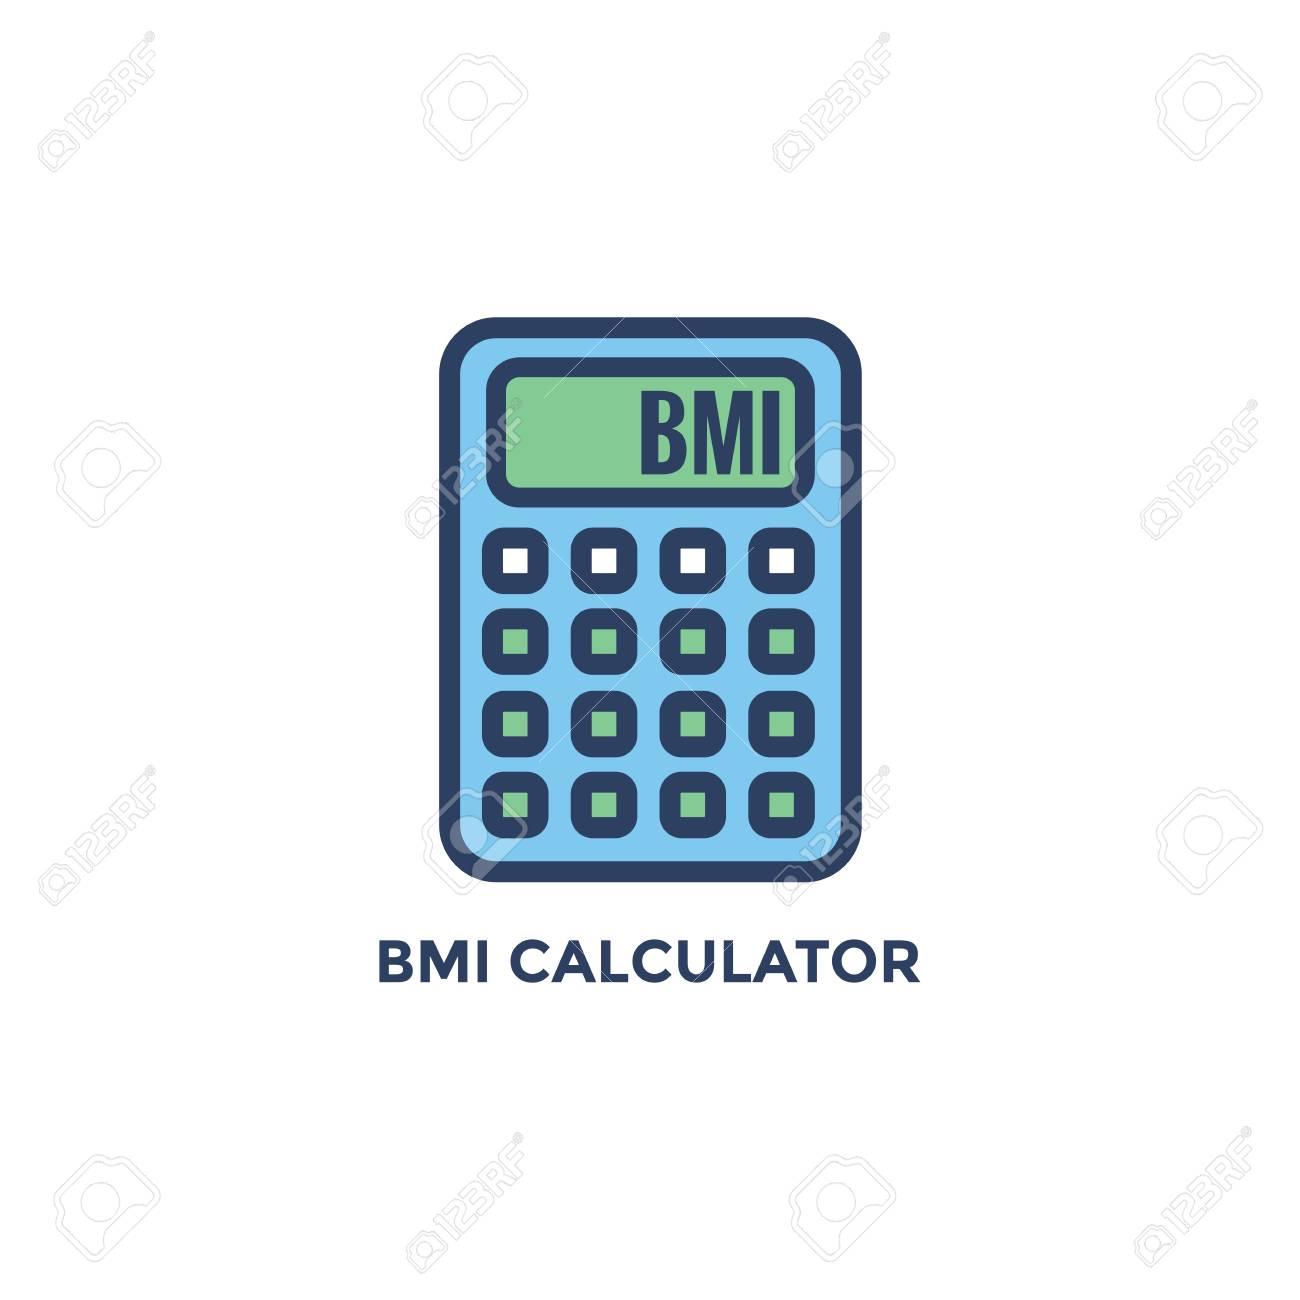 BMI - Body Mass Index Icon - BMI Calculator - green and blue